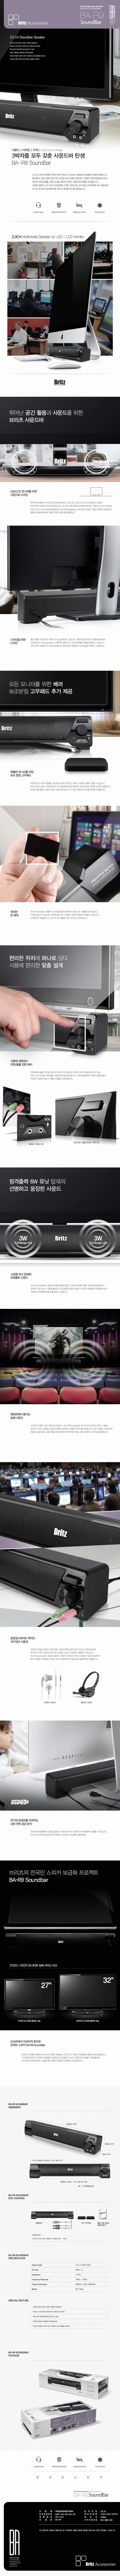 Britz 2019 Sound Bar9 사운드바 브리츠 스피커 2채널 - 갓샵, 29,750원, 스피커, PC스피커